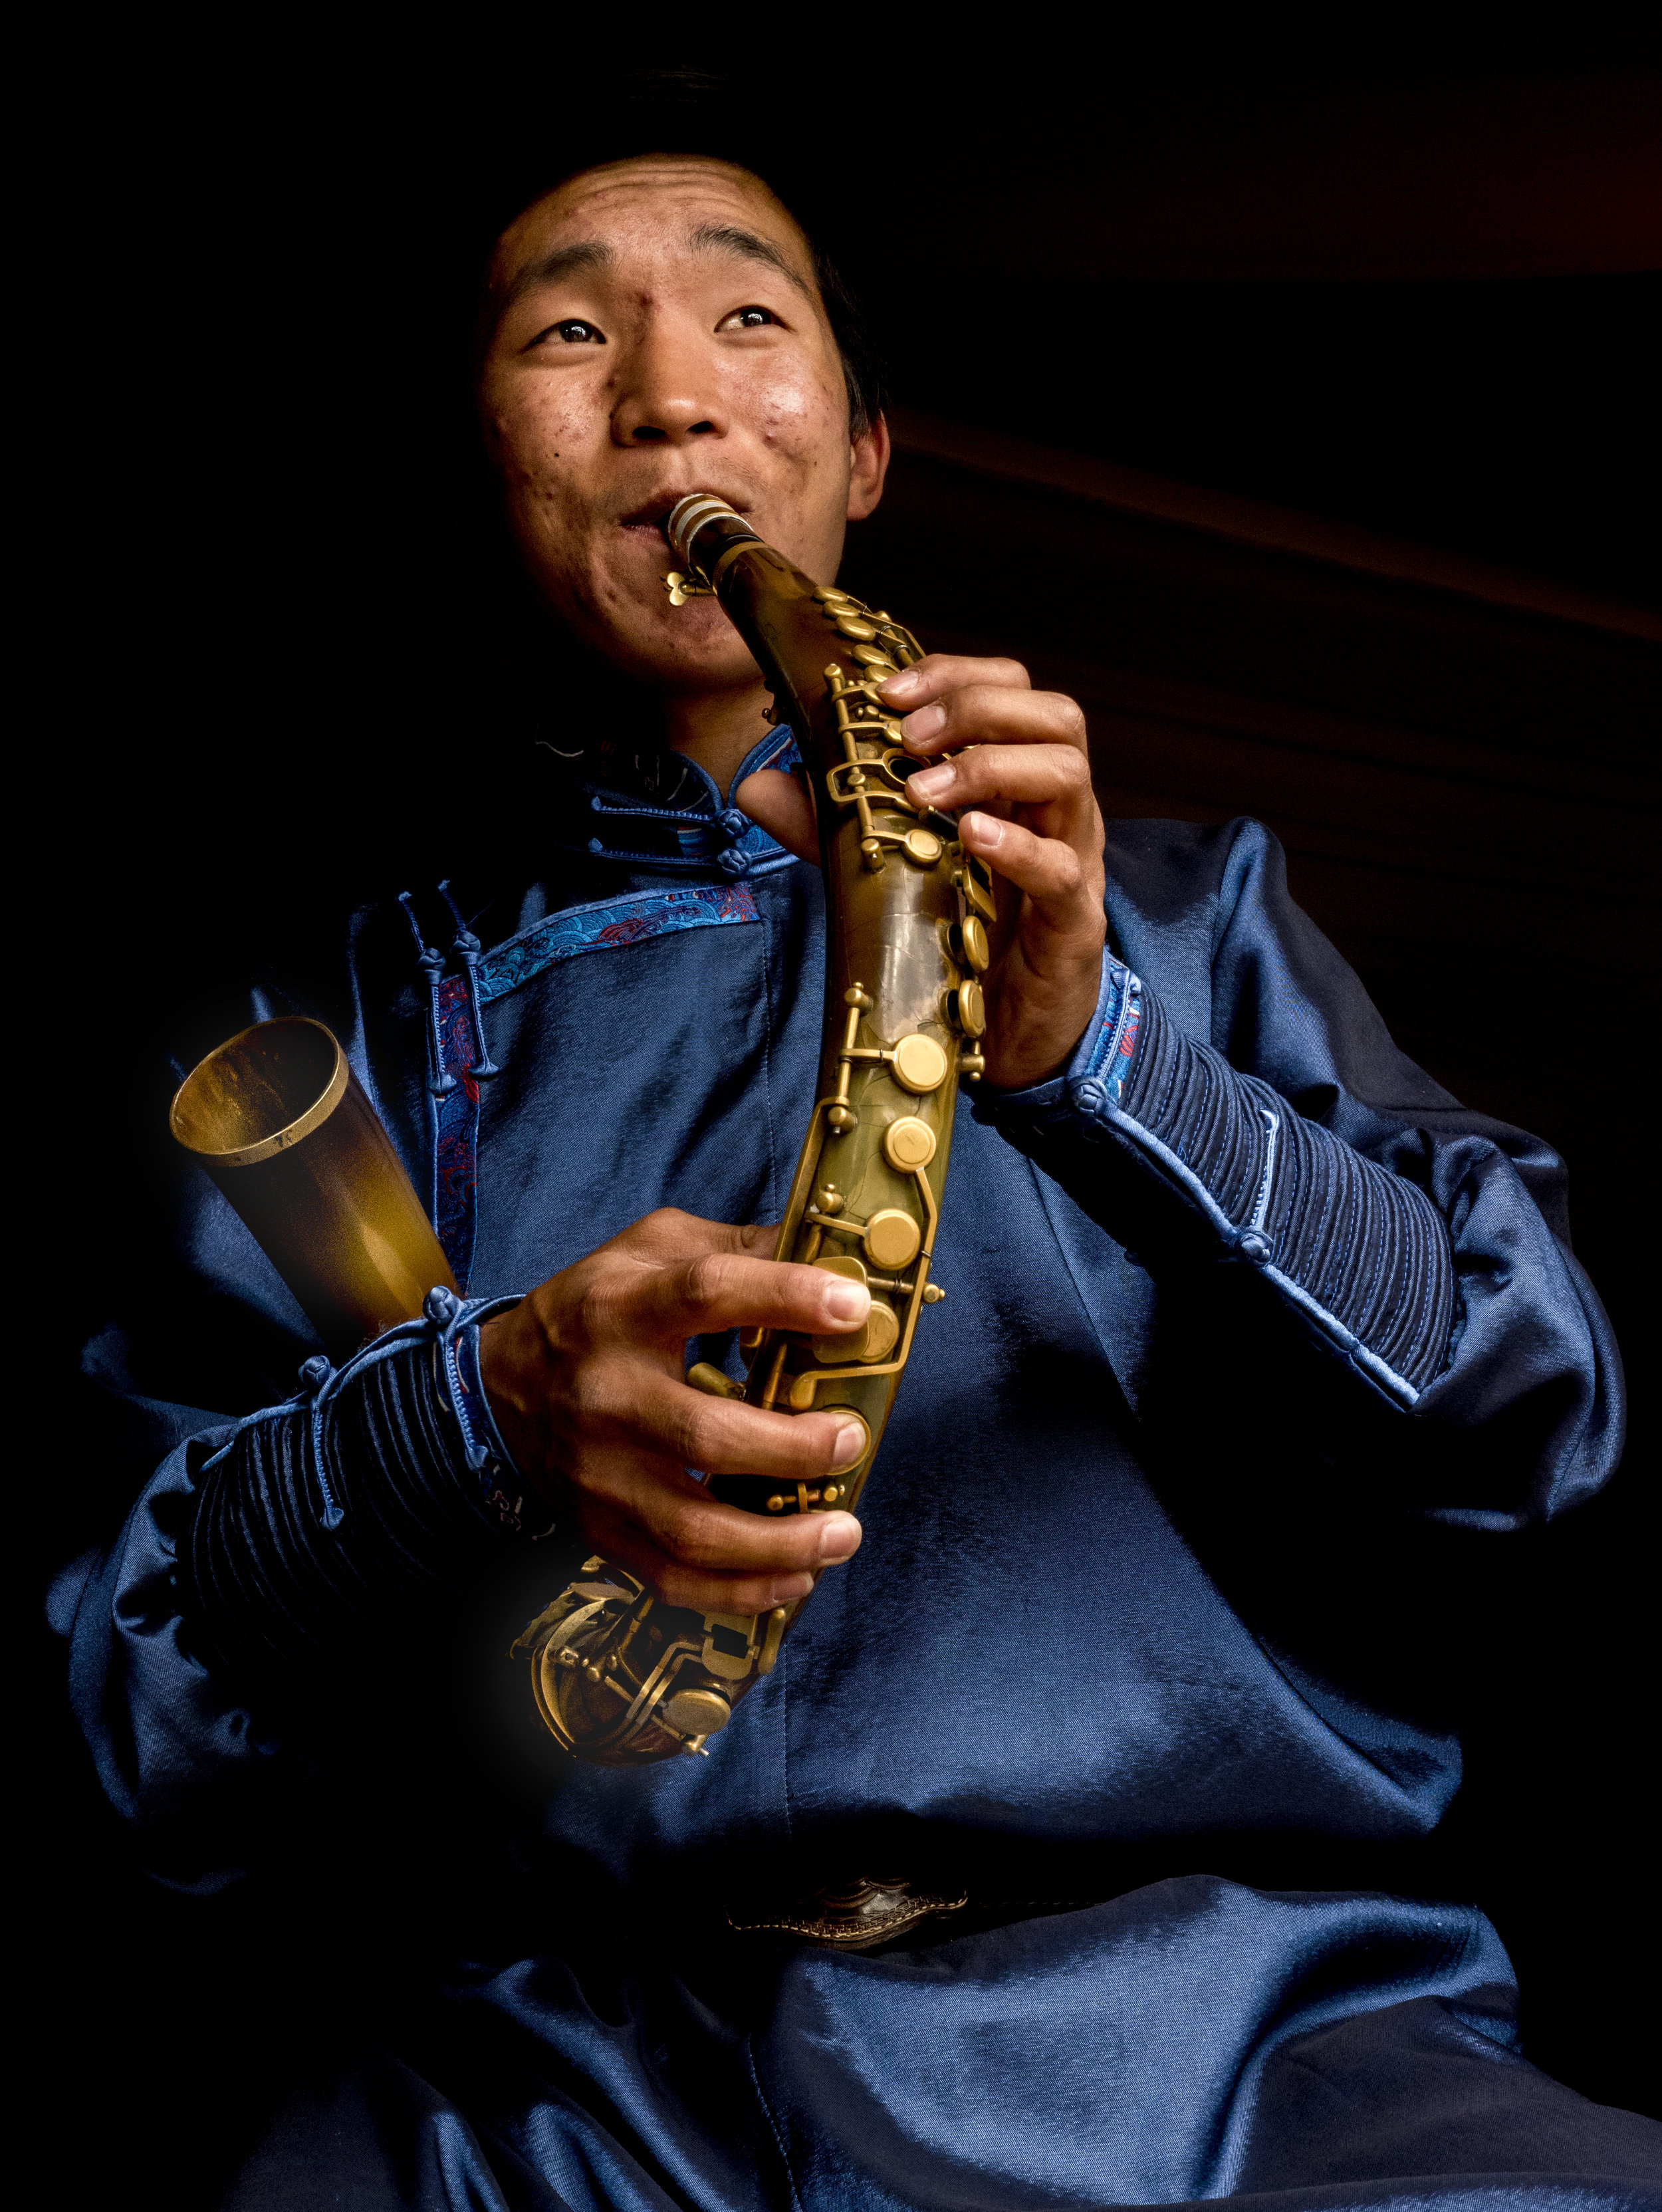 mongolian musician.jpg